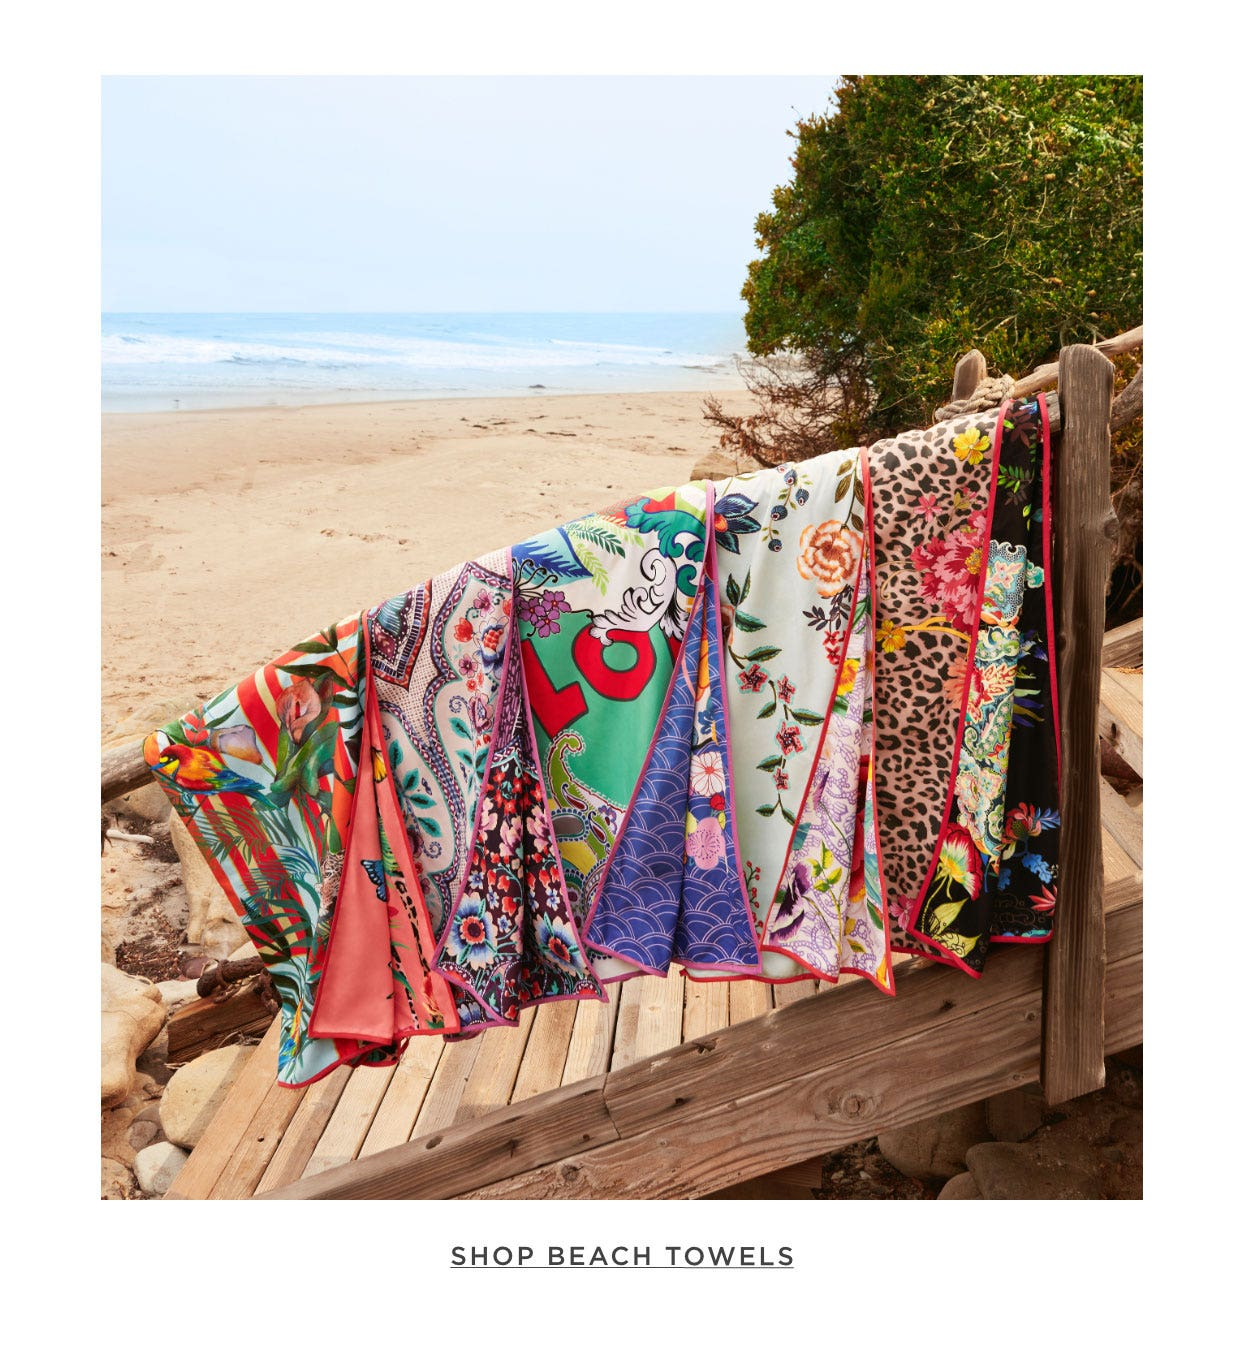 Shop Beach Towels